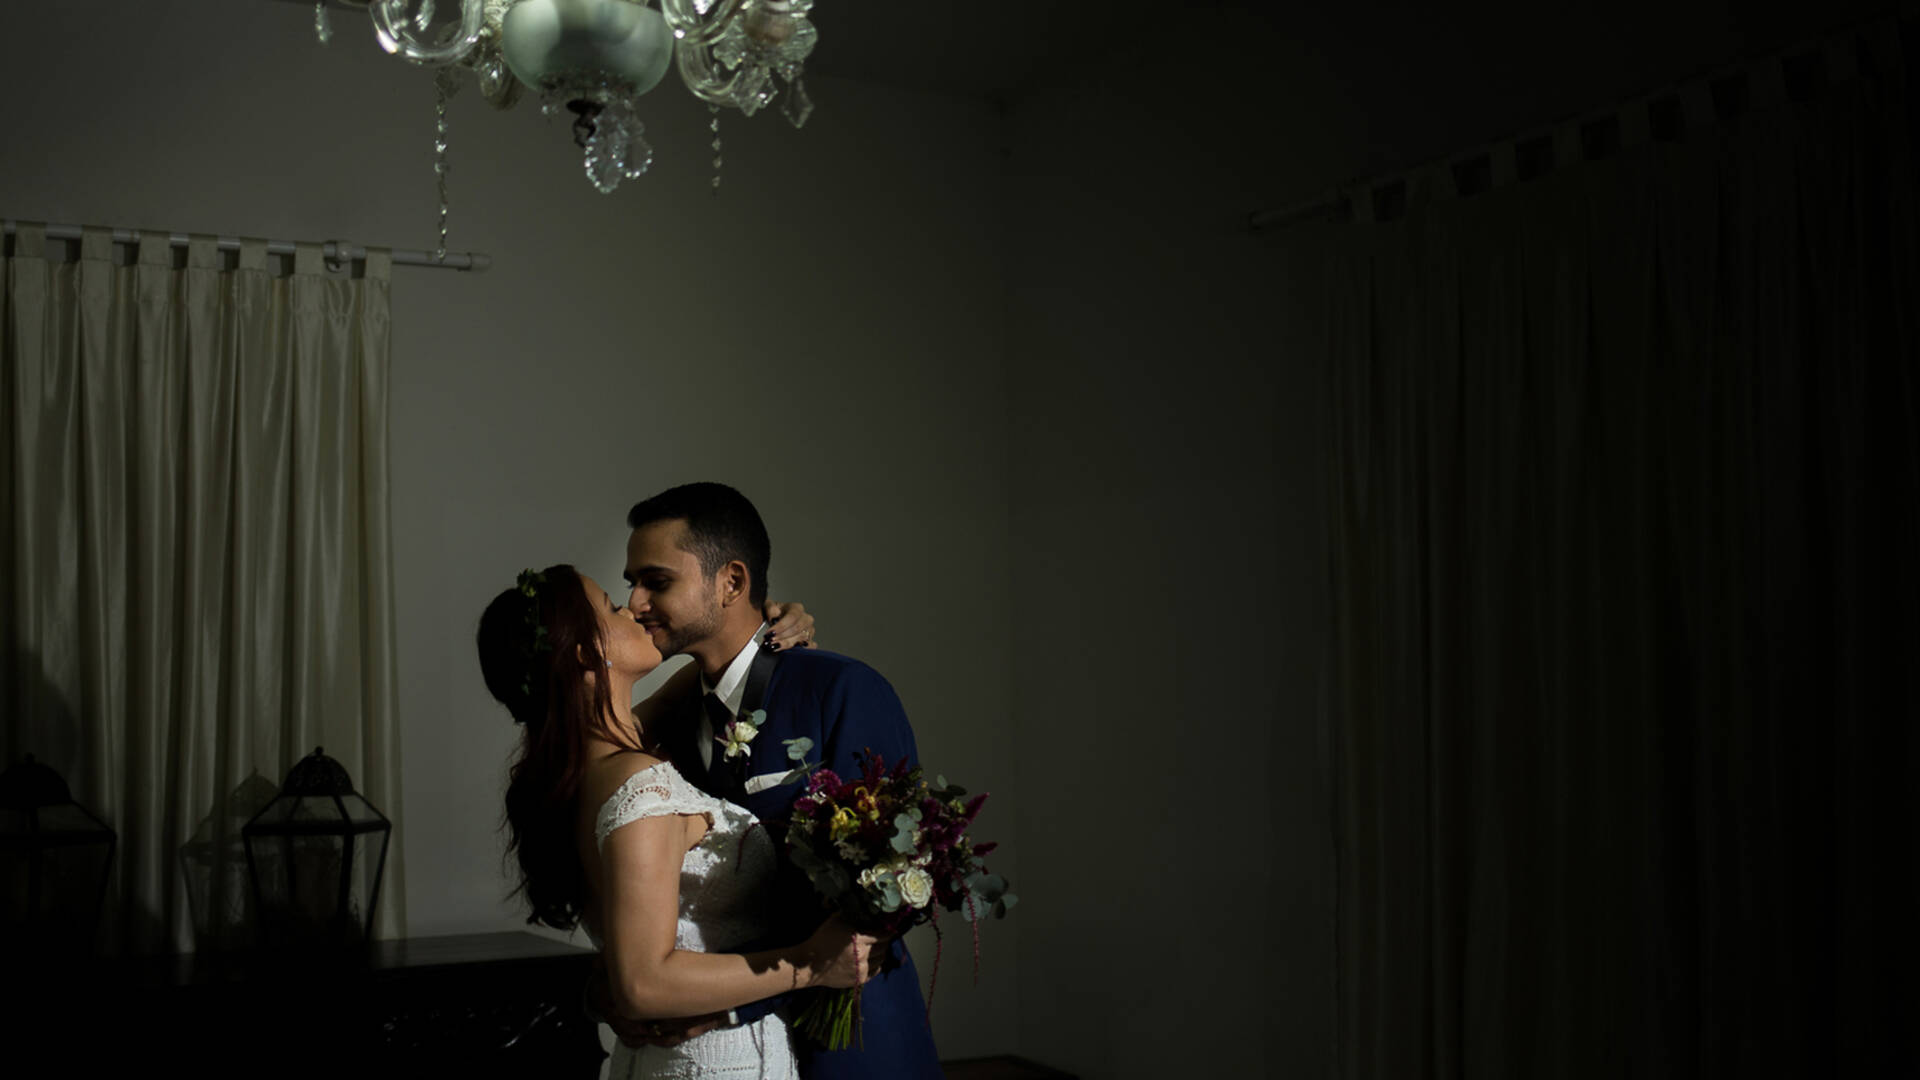 Casamento de Julianne + Wdson